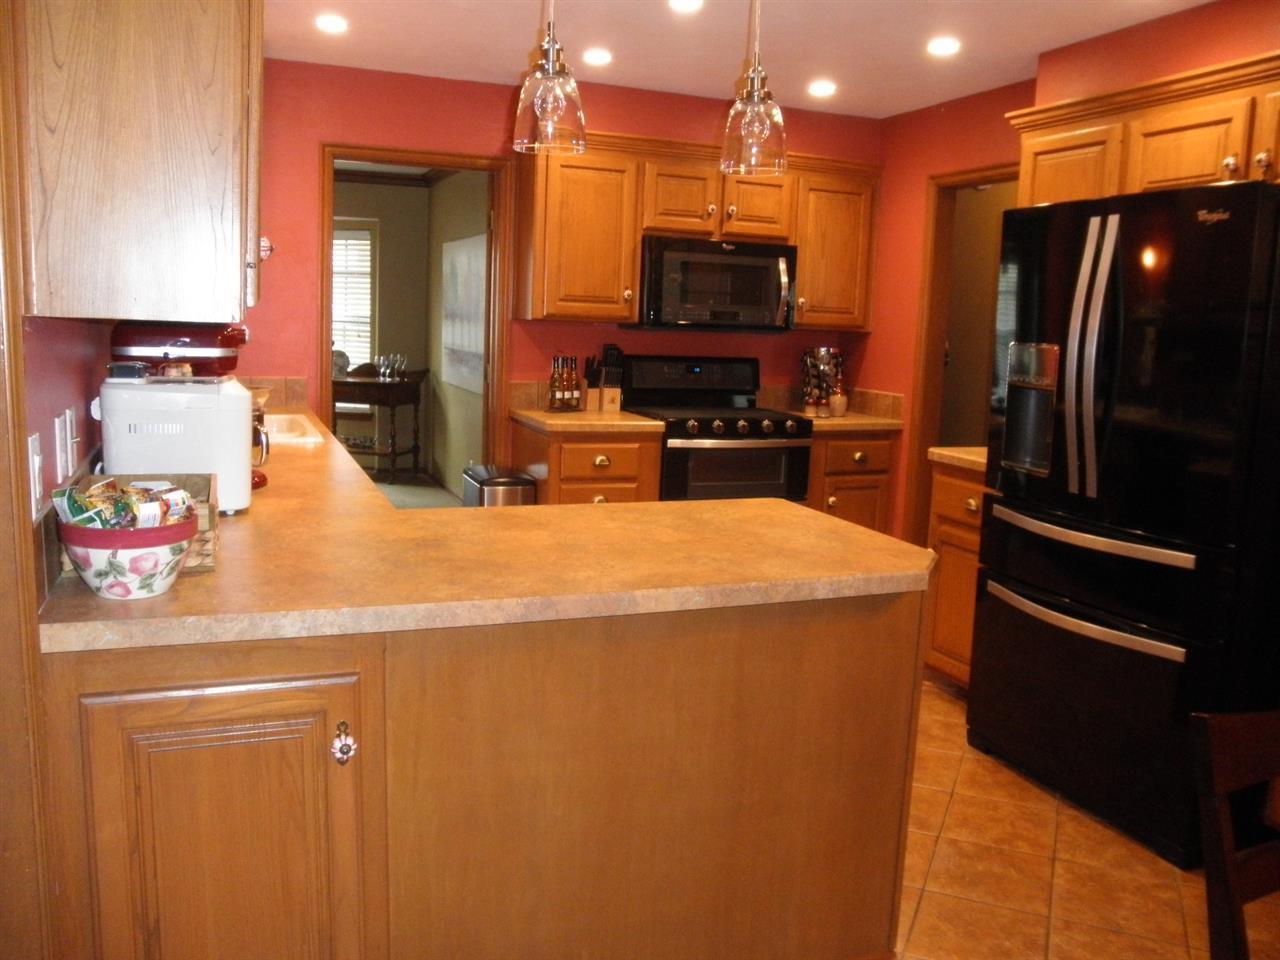 Sold Intraoffice W/MLS | 2800 Green Meadow Ponca City, OK 74604 8